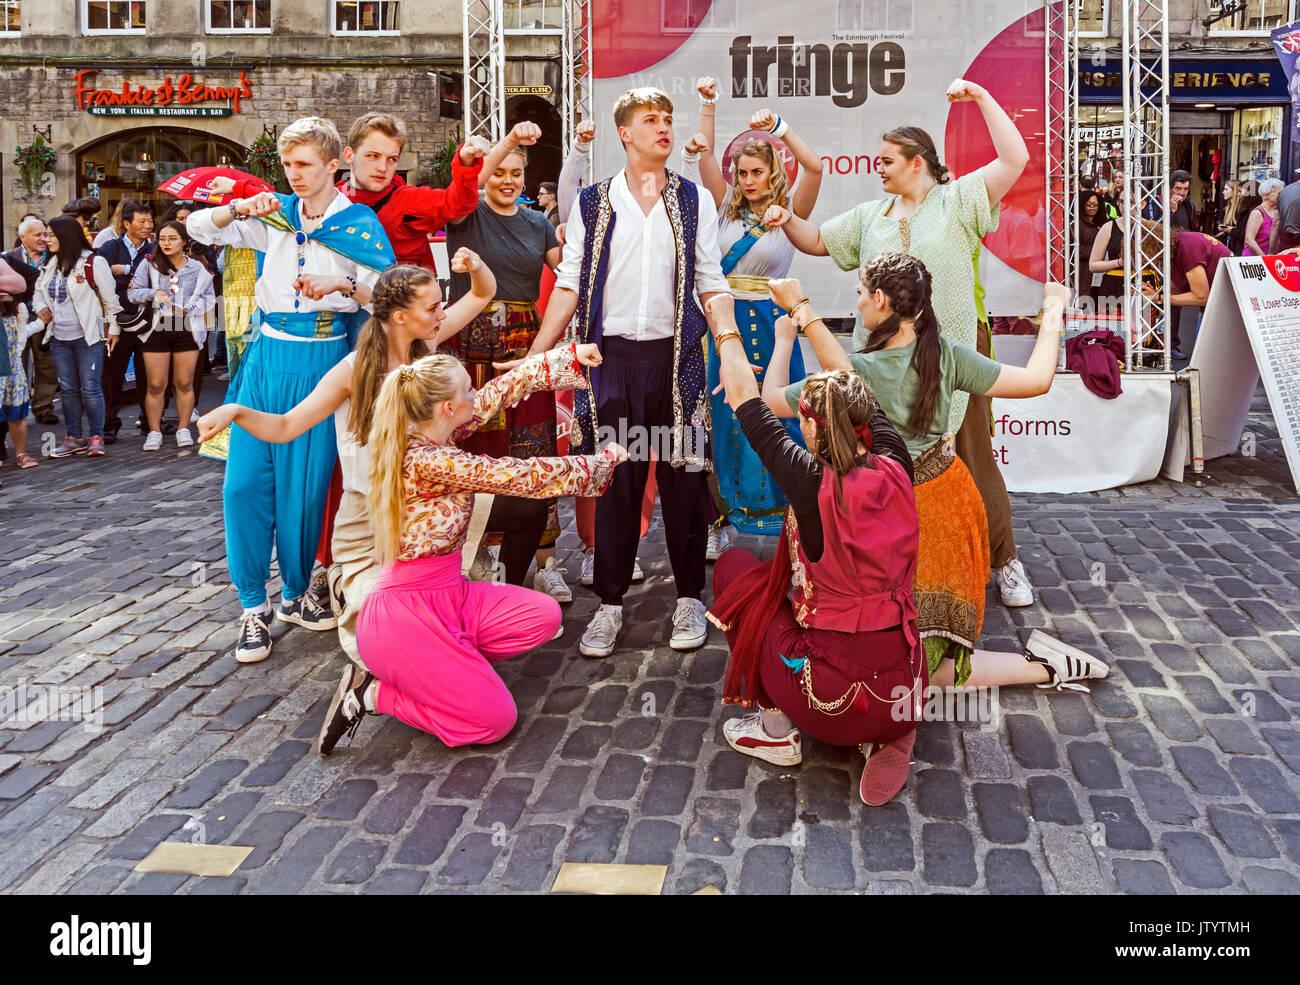 Artistic group Aladdin performing at Edinburgh Festival Fringe 2017 in the High Street of the Royal Mile Edinburgh Scotland UK - Stock Image